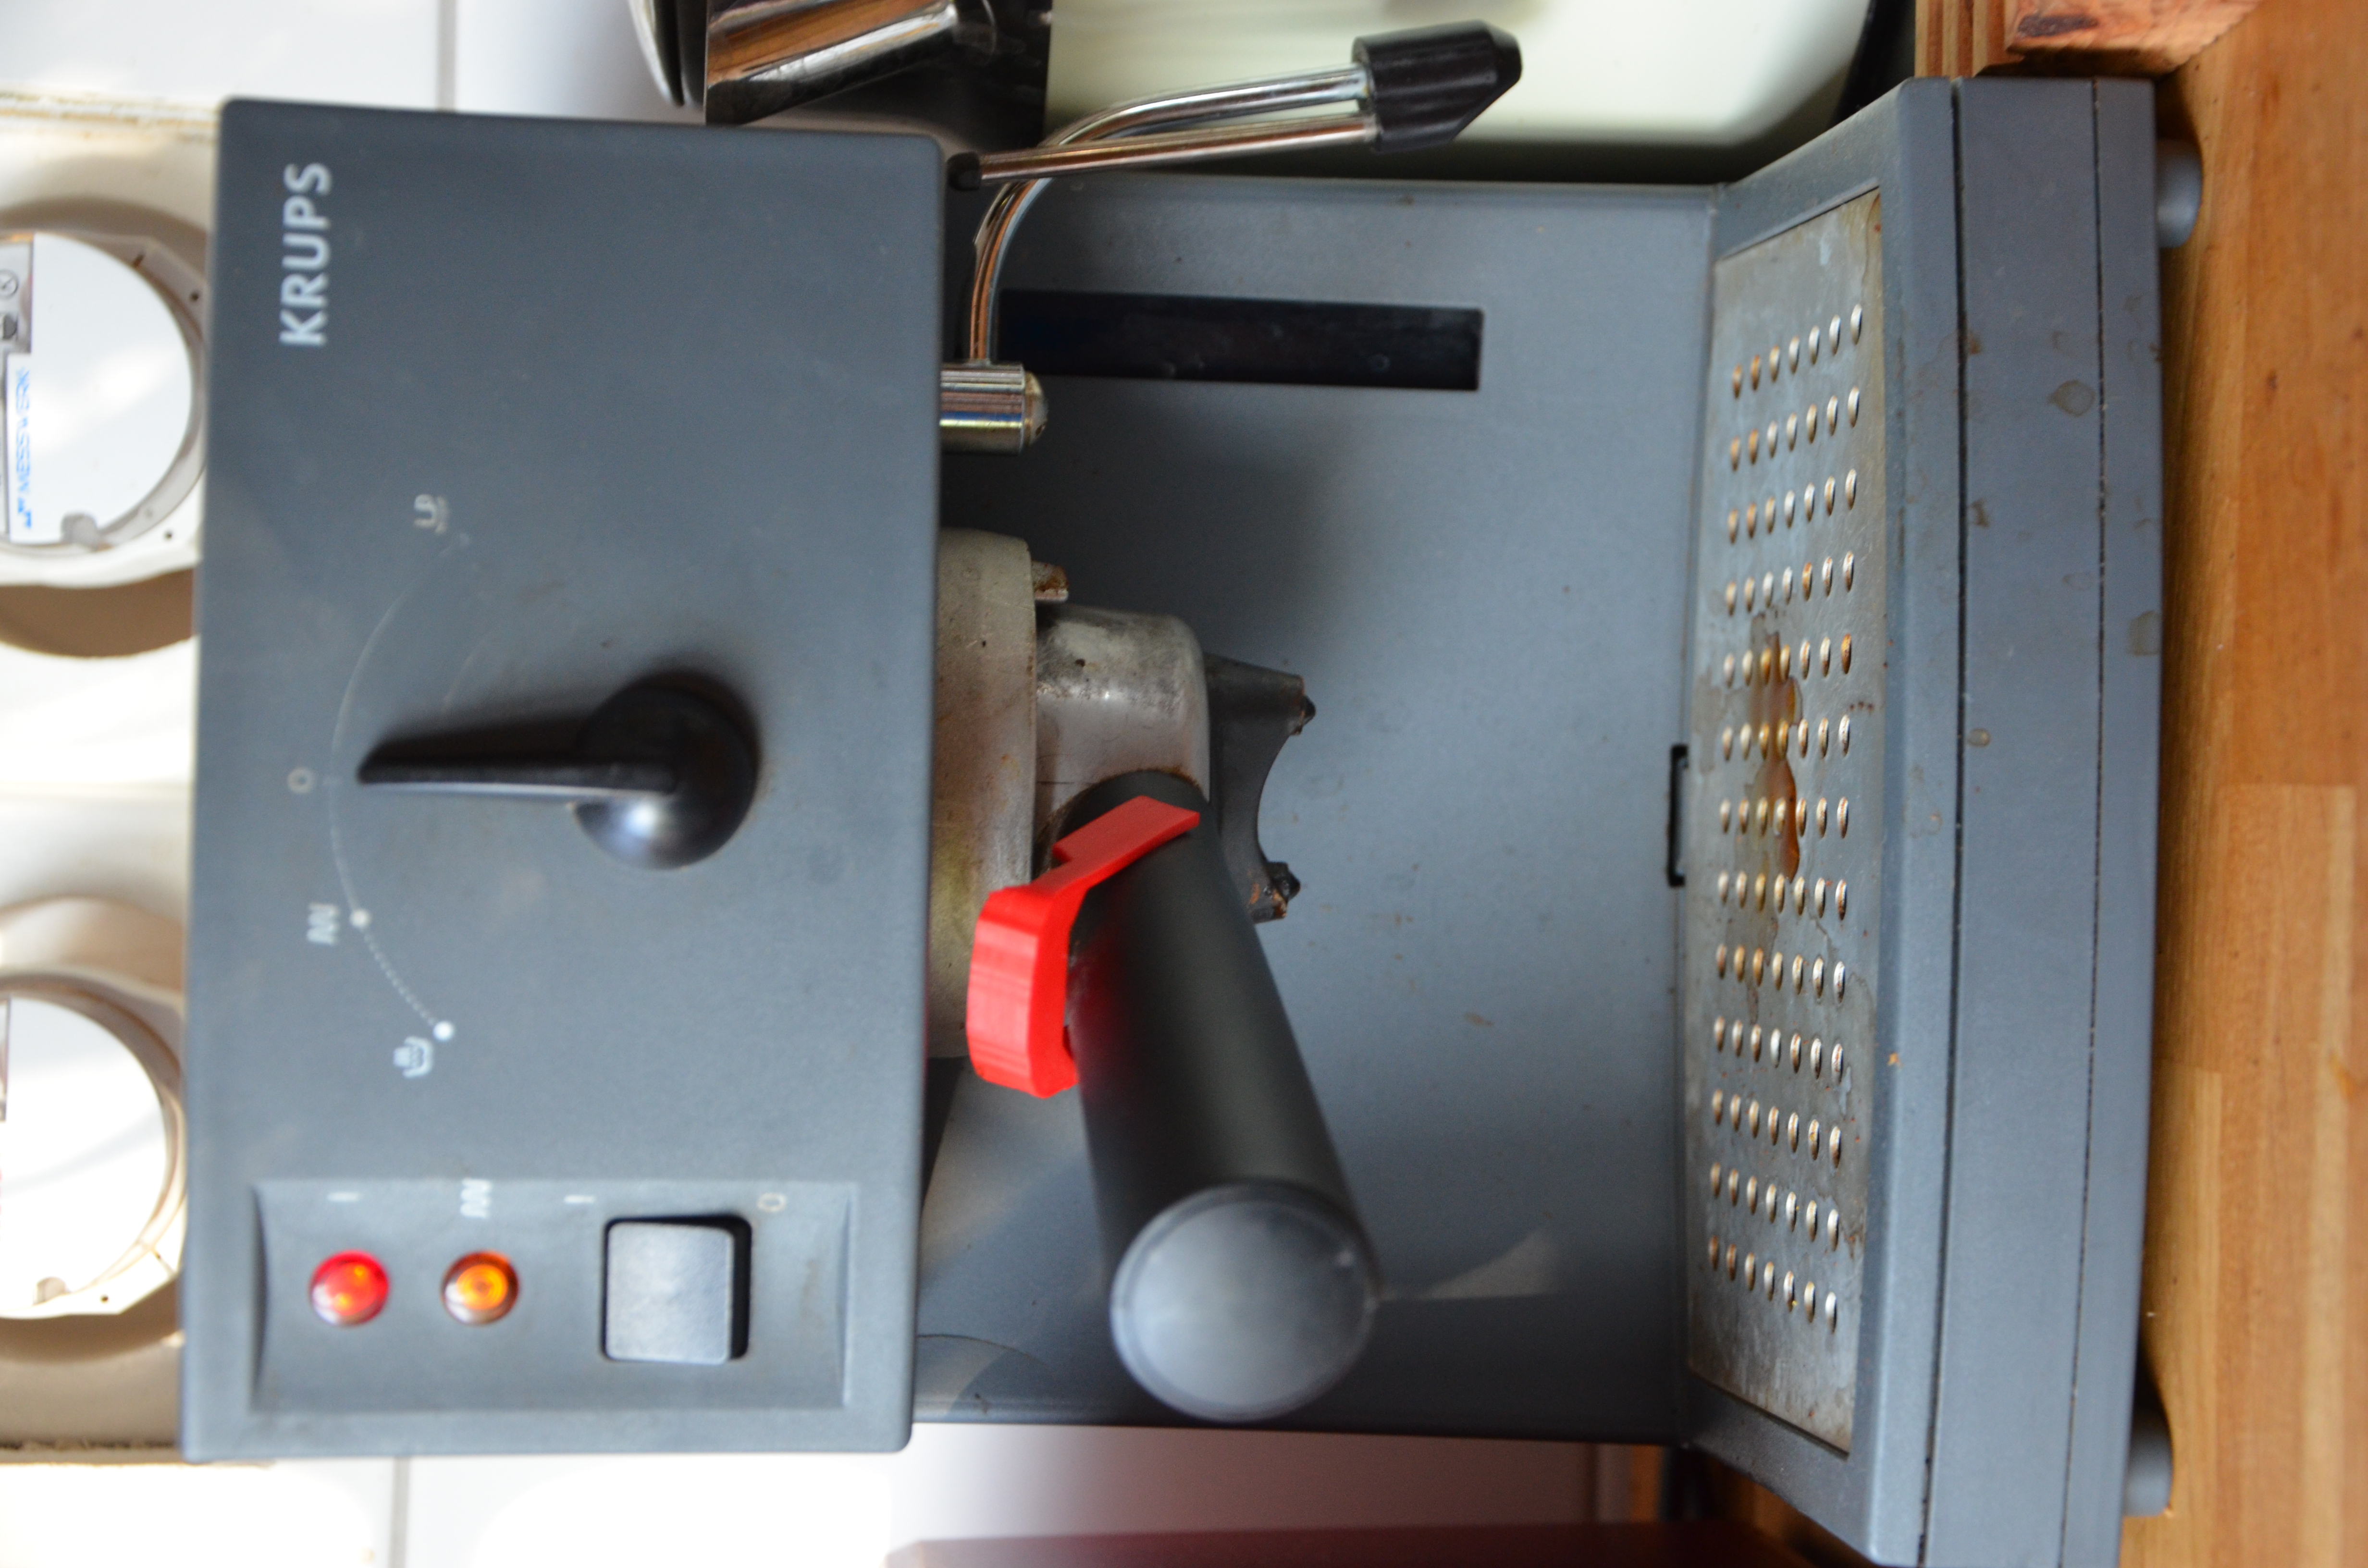 DSC_0503.JPG Download free STL file Espresso Maker clip • 3D printer object, mierendorffplatz